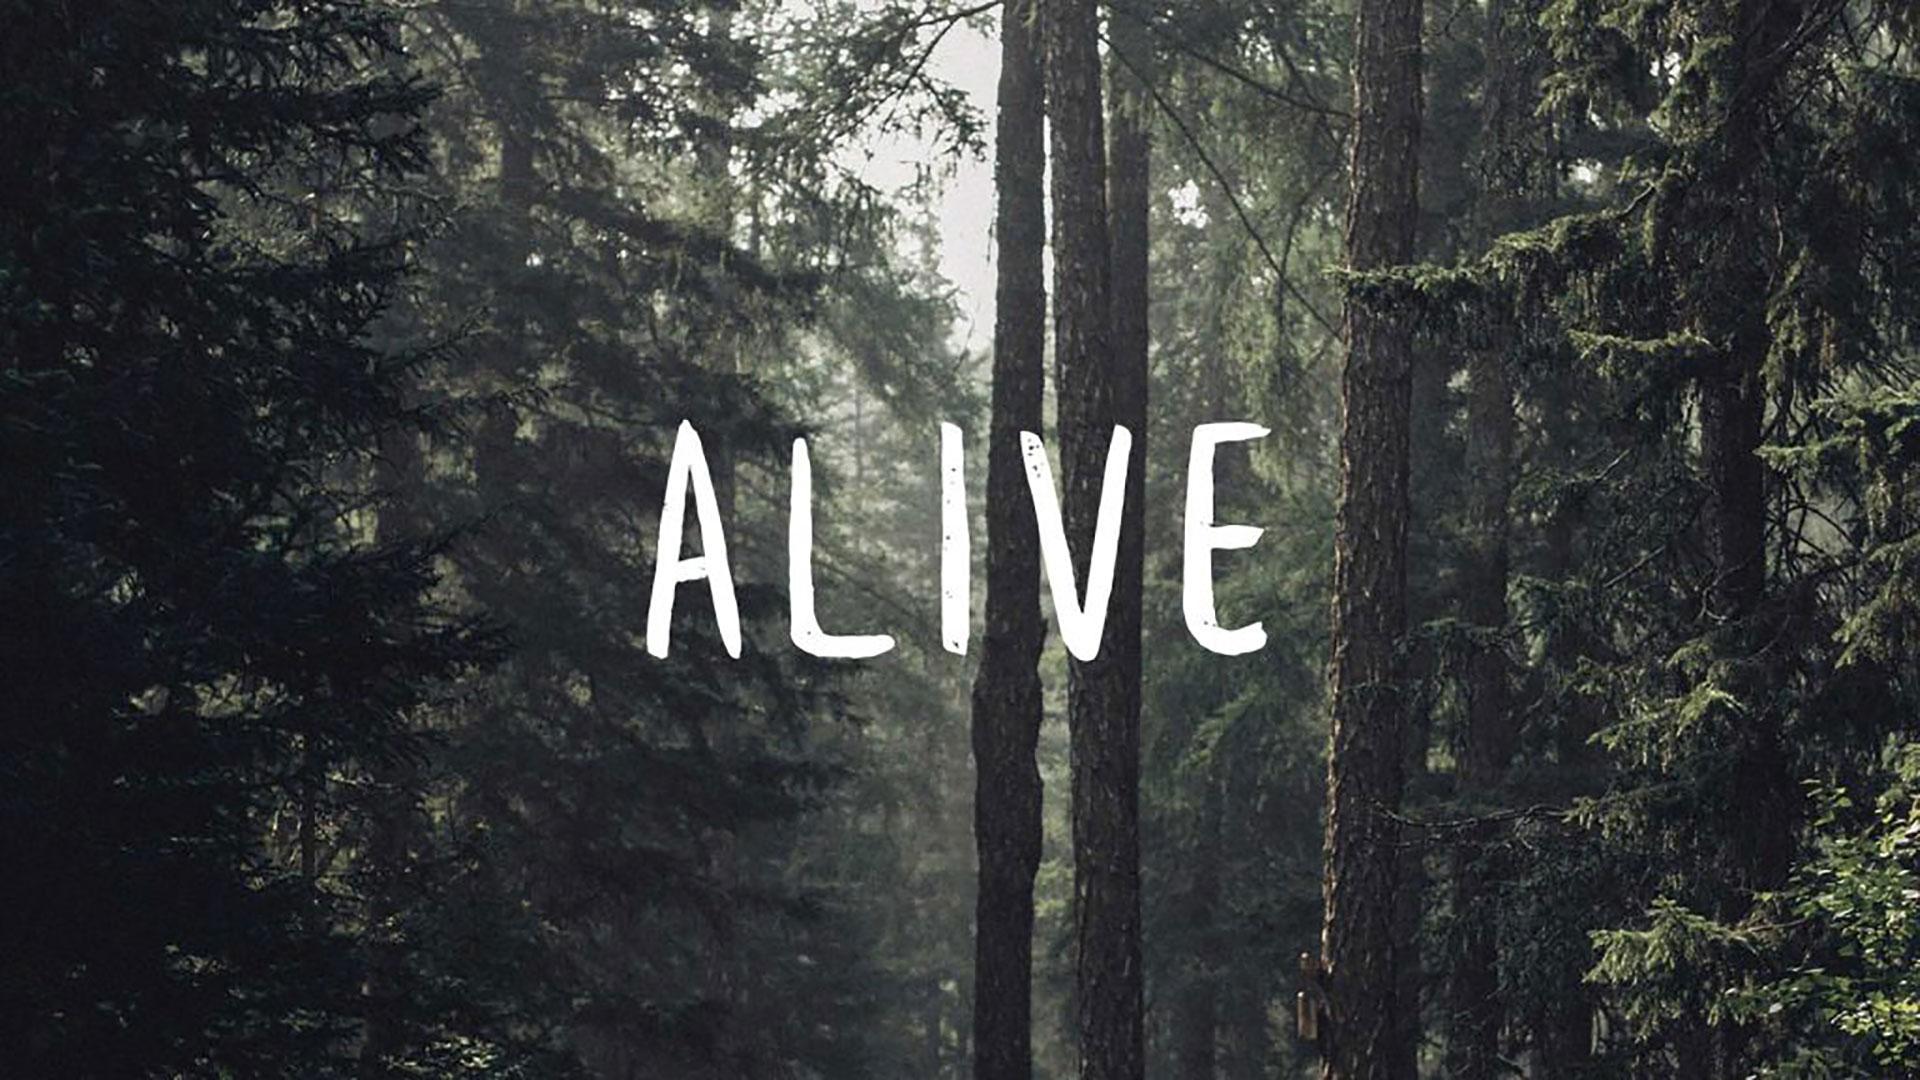 Series: Alive